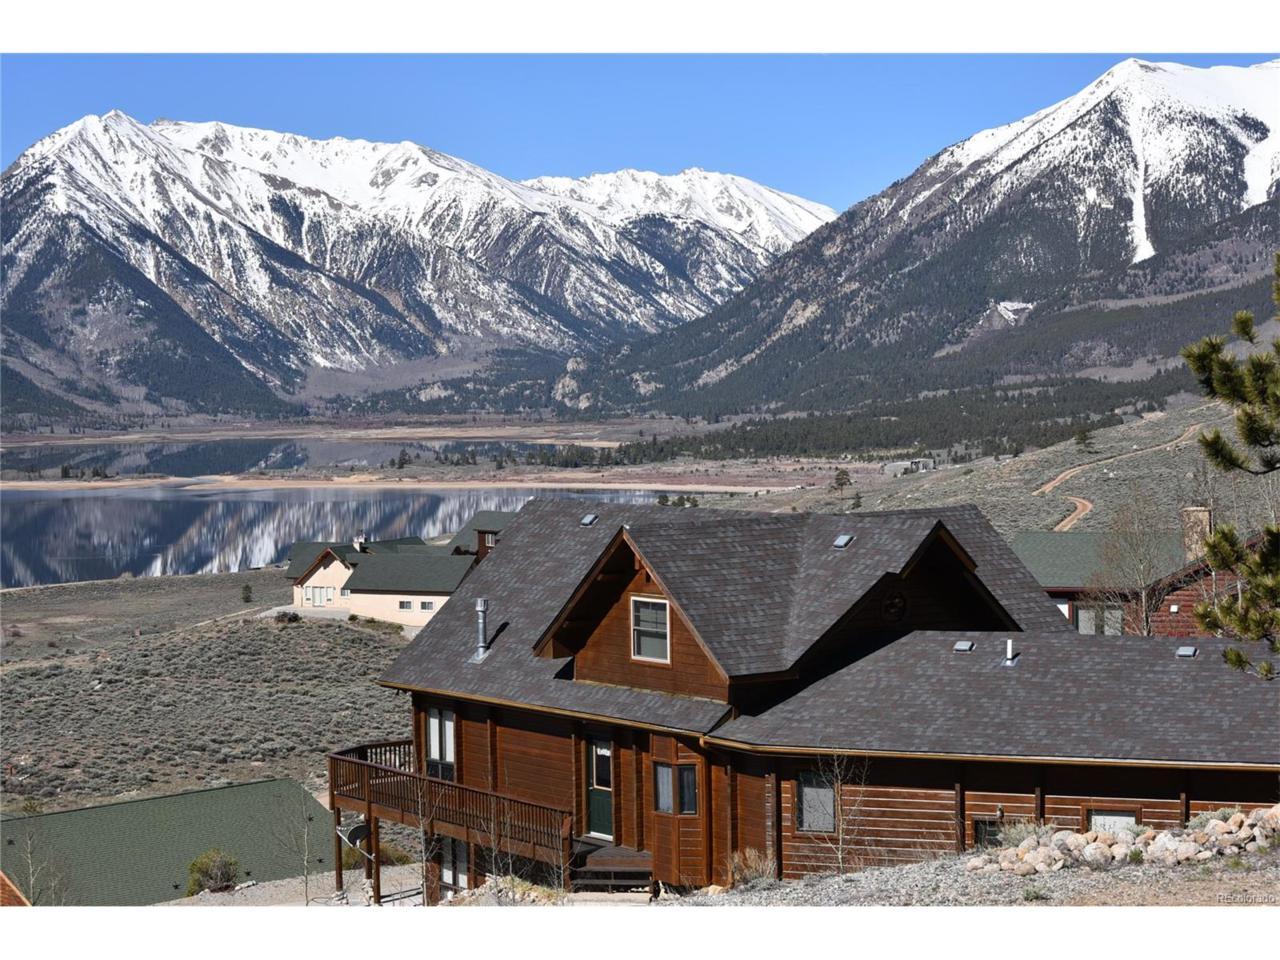 332 Twin Peaks Drive, Twin Lakes, CO 81251 (MLS #8261957) :: 8z Real Estate